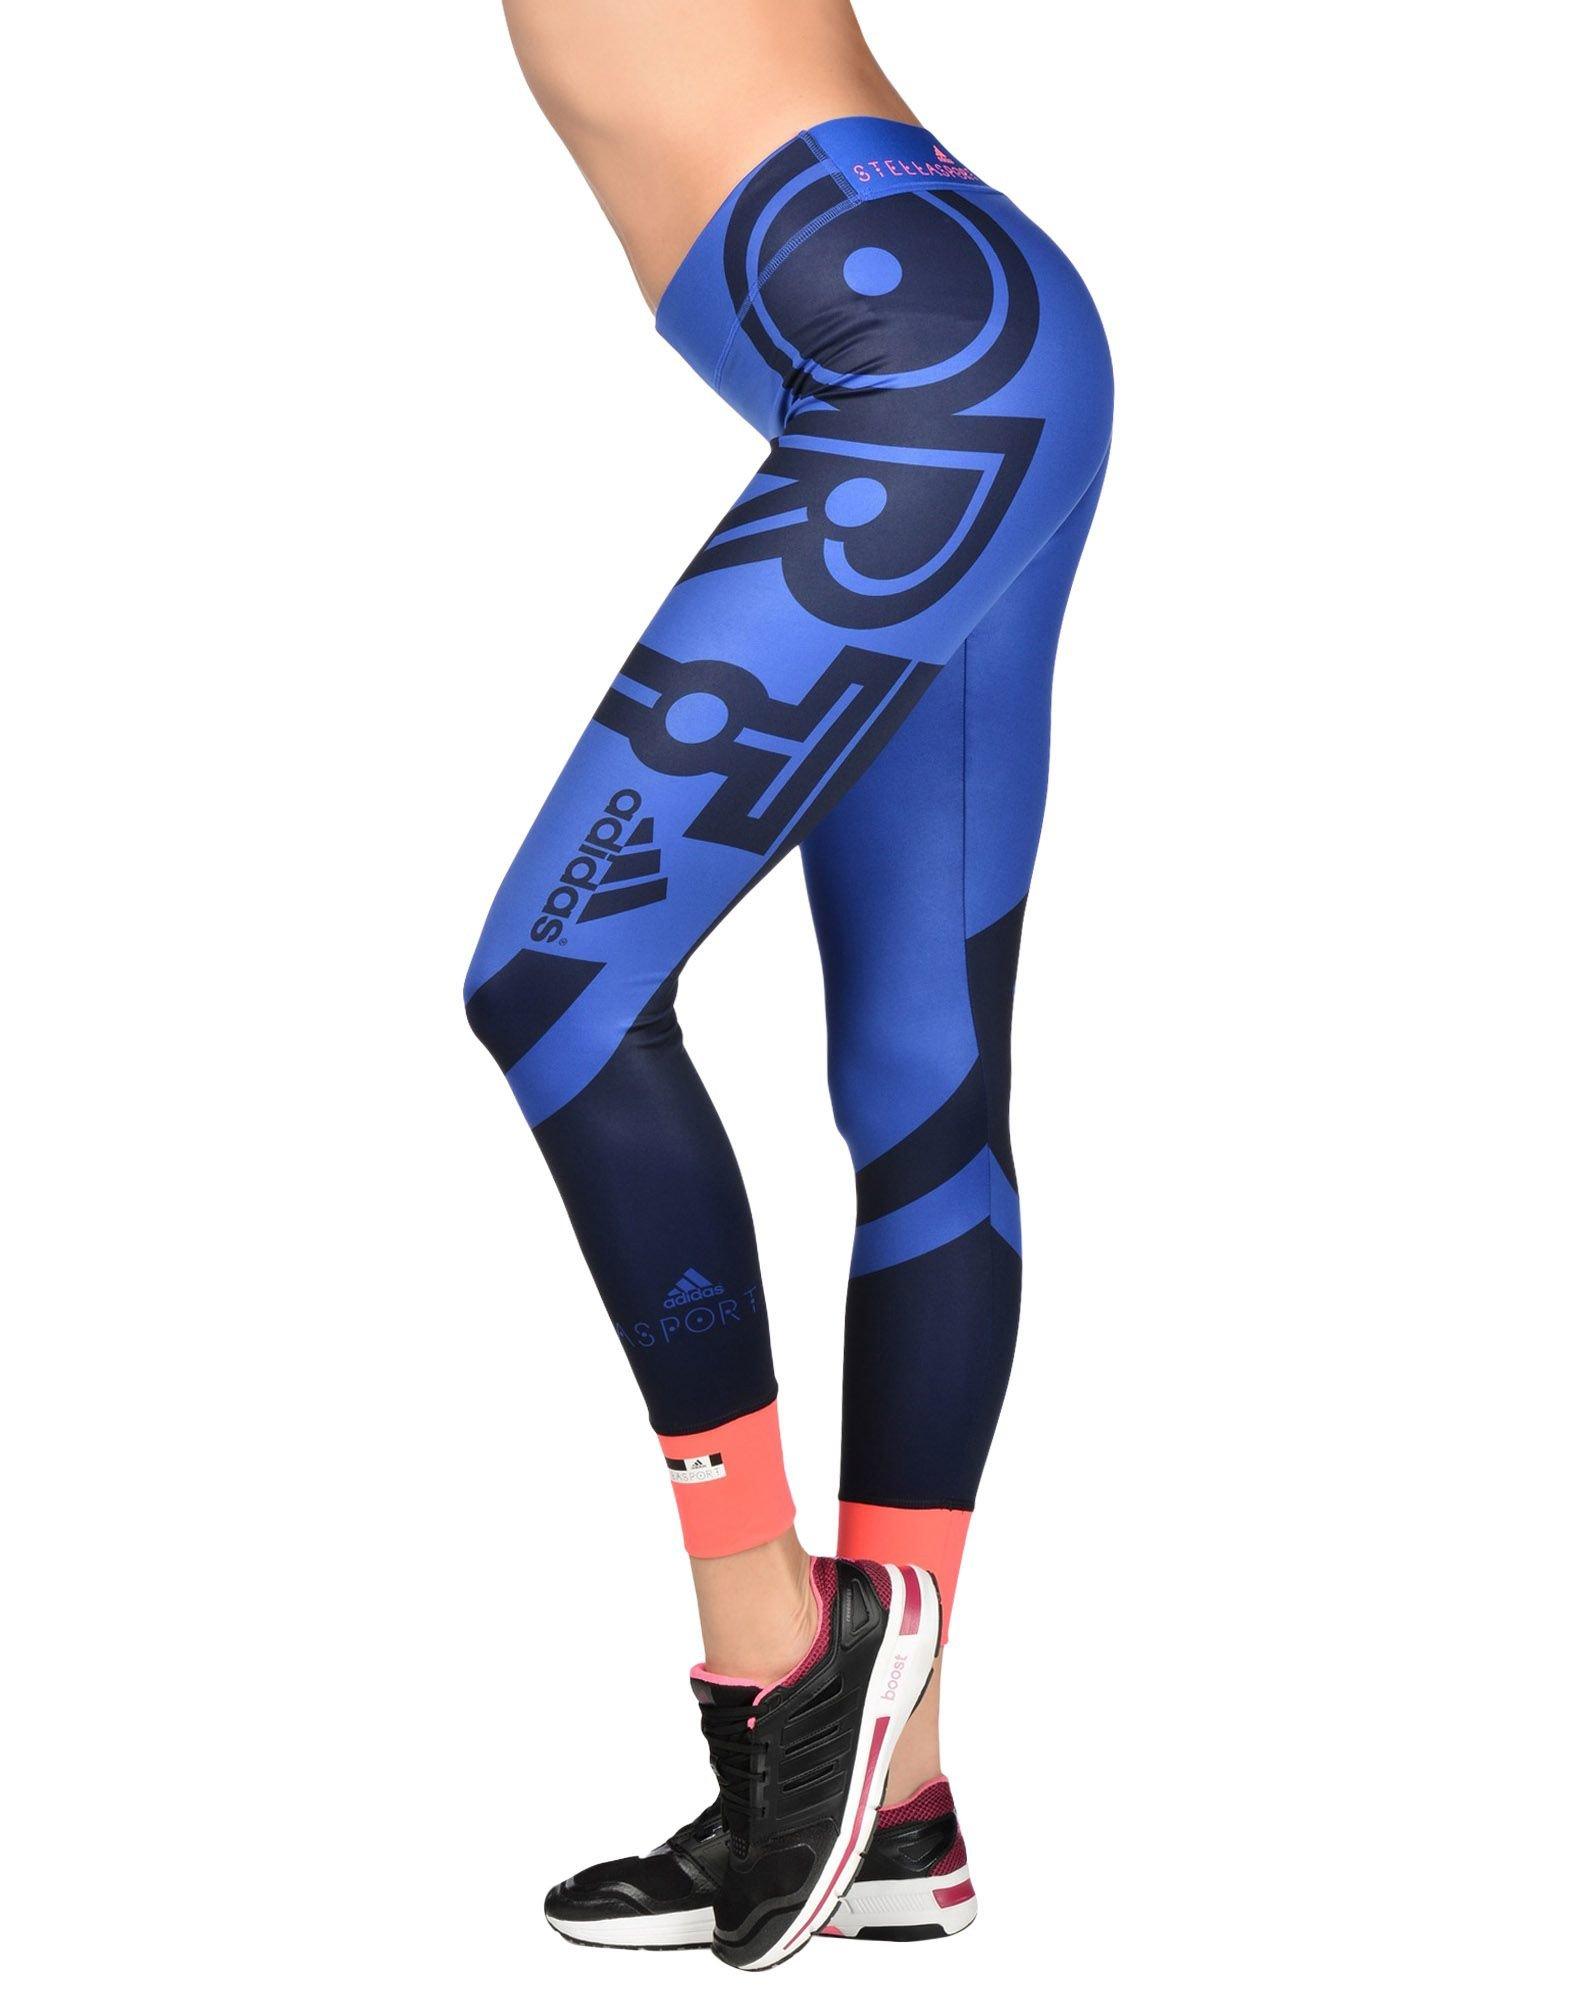 adidas by stella mccartney leggings in blue lyst. Black Bedroom Furniture Sets. Home Design Ideas